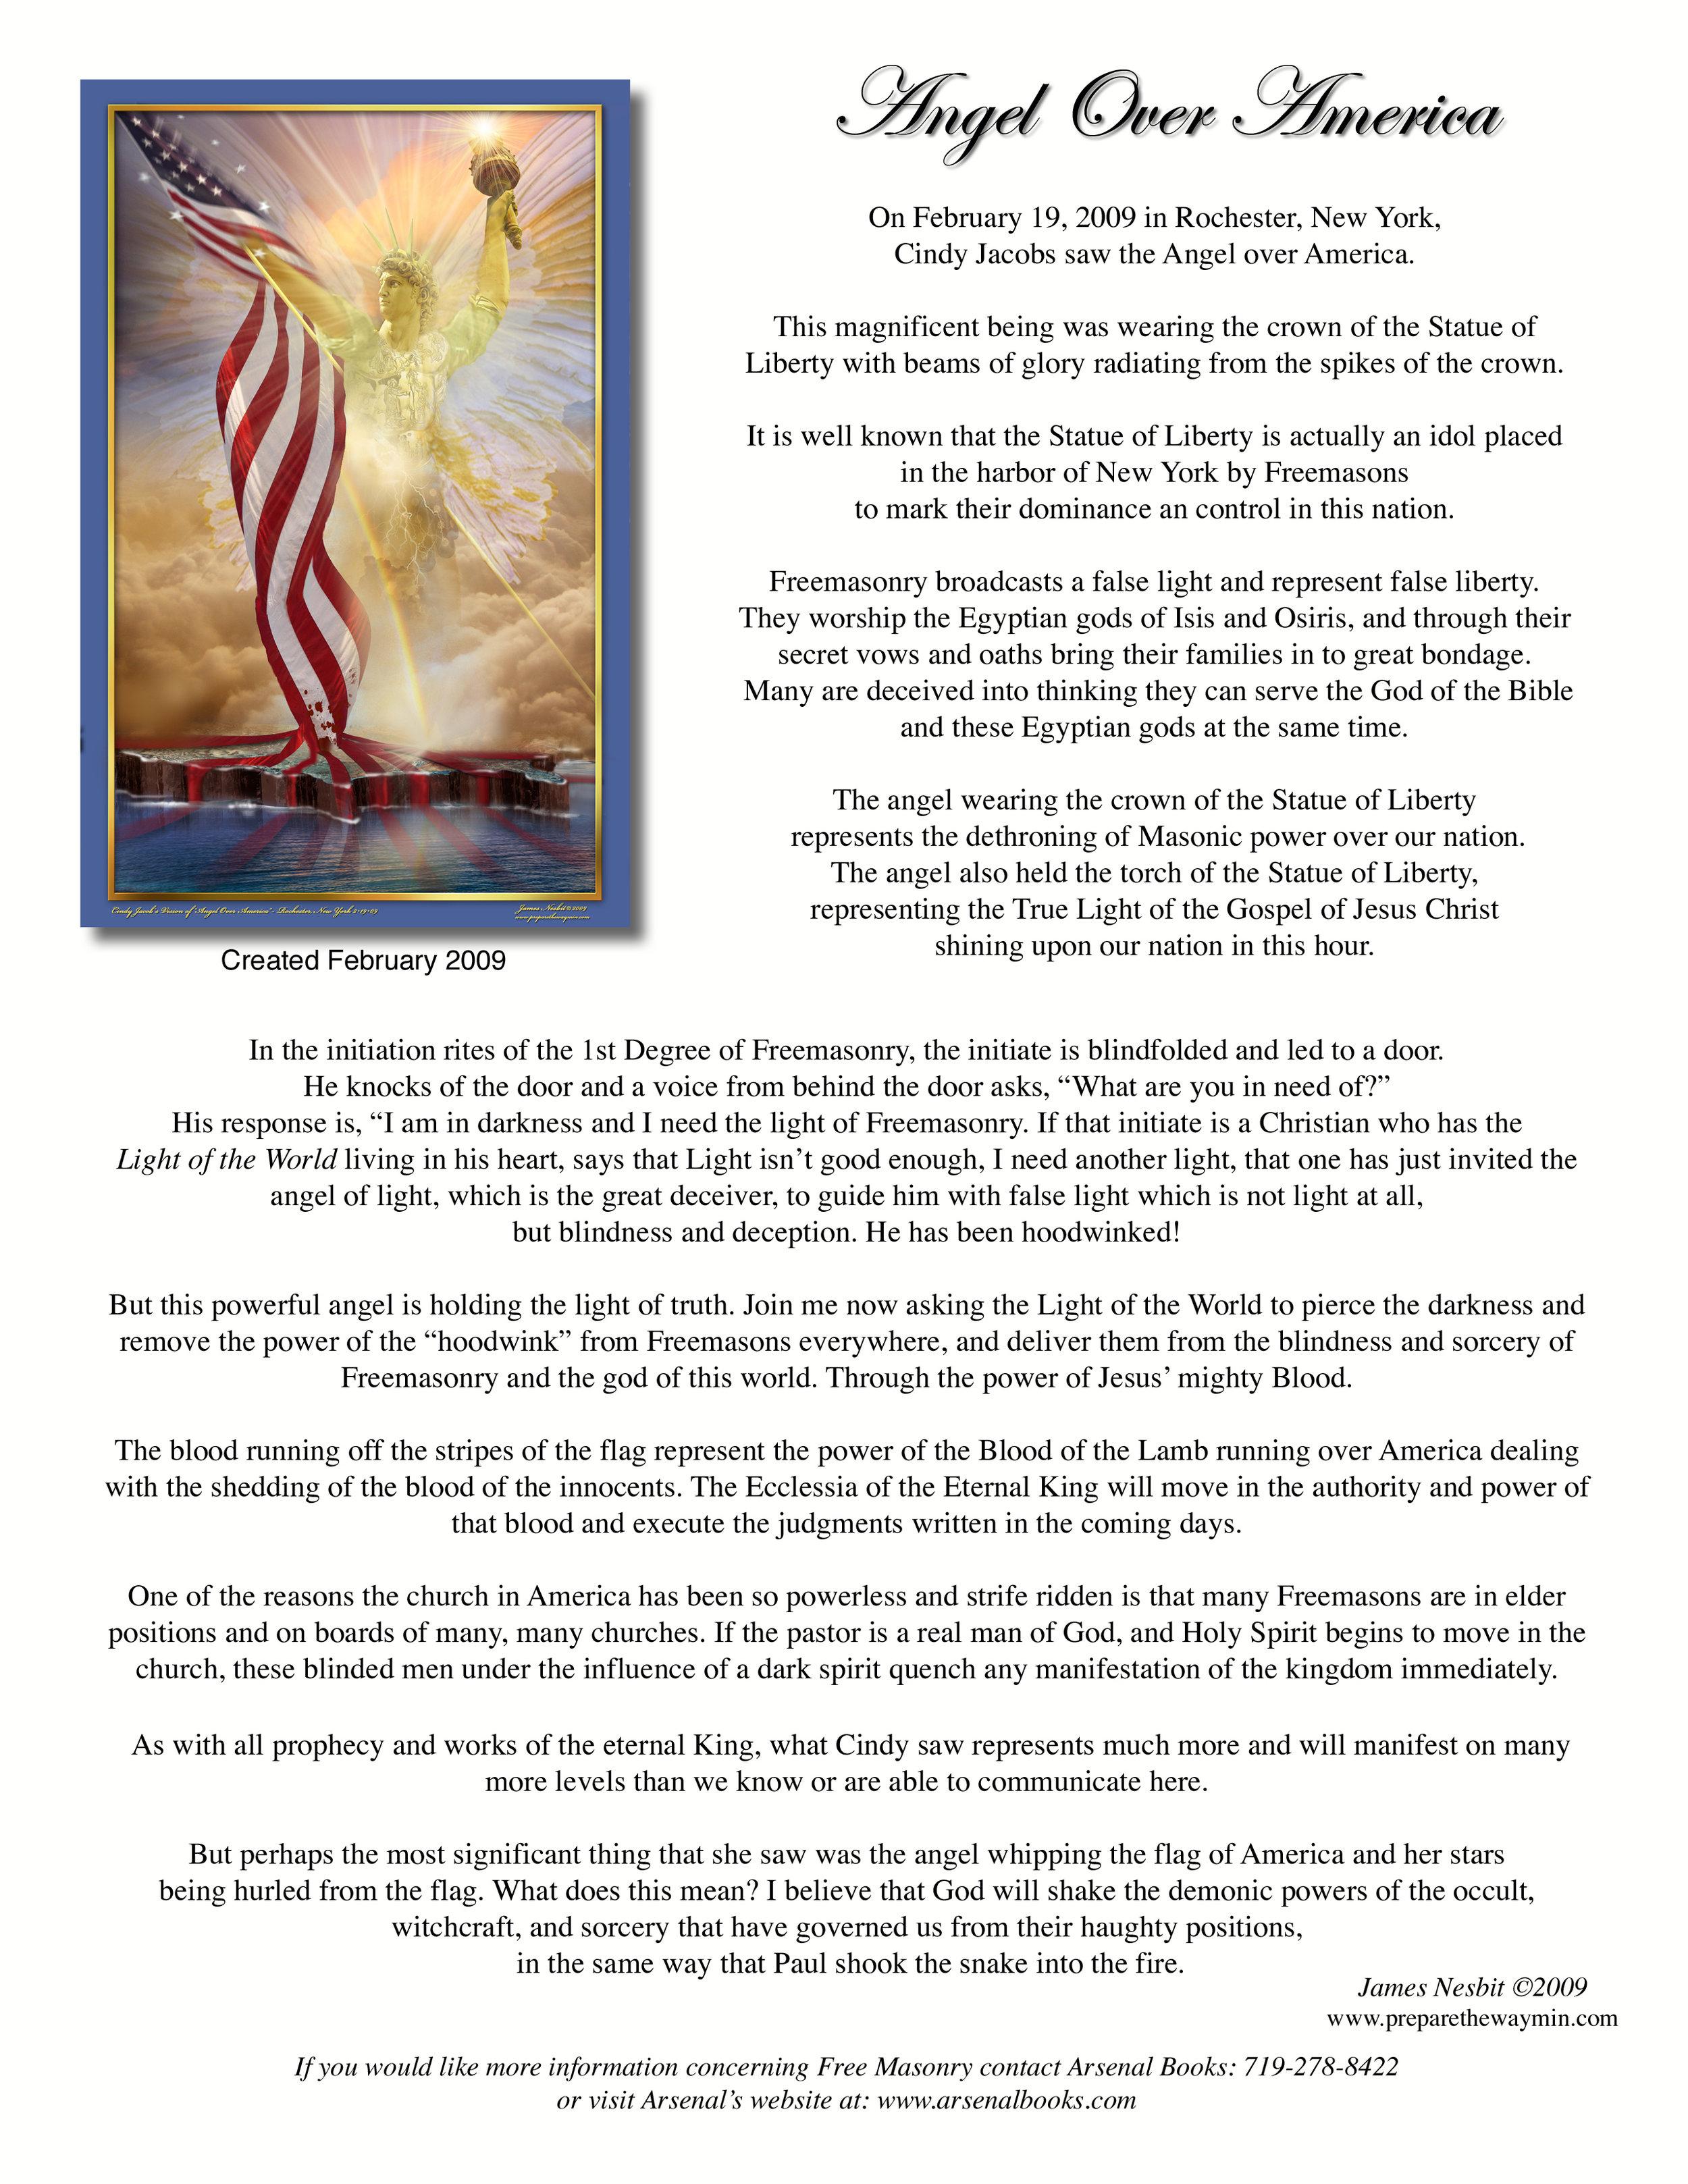 Angel Over America Descript copy.jpg